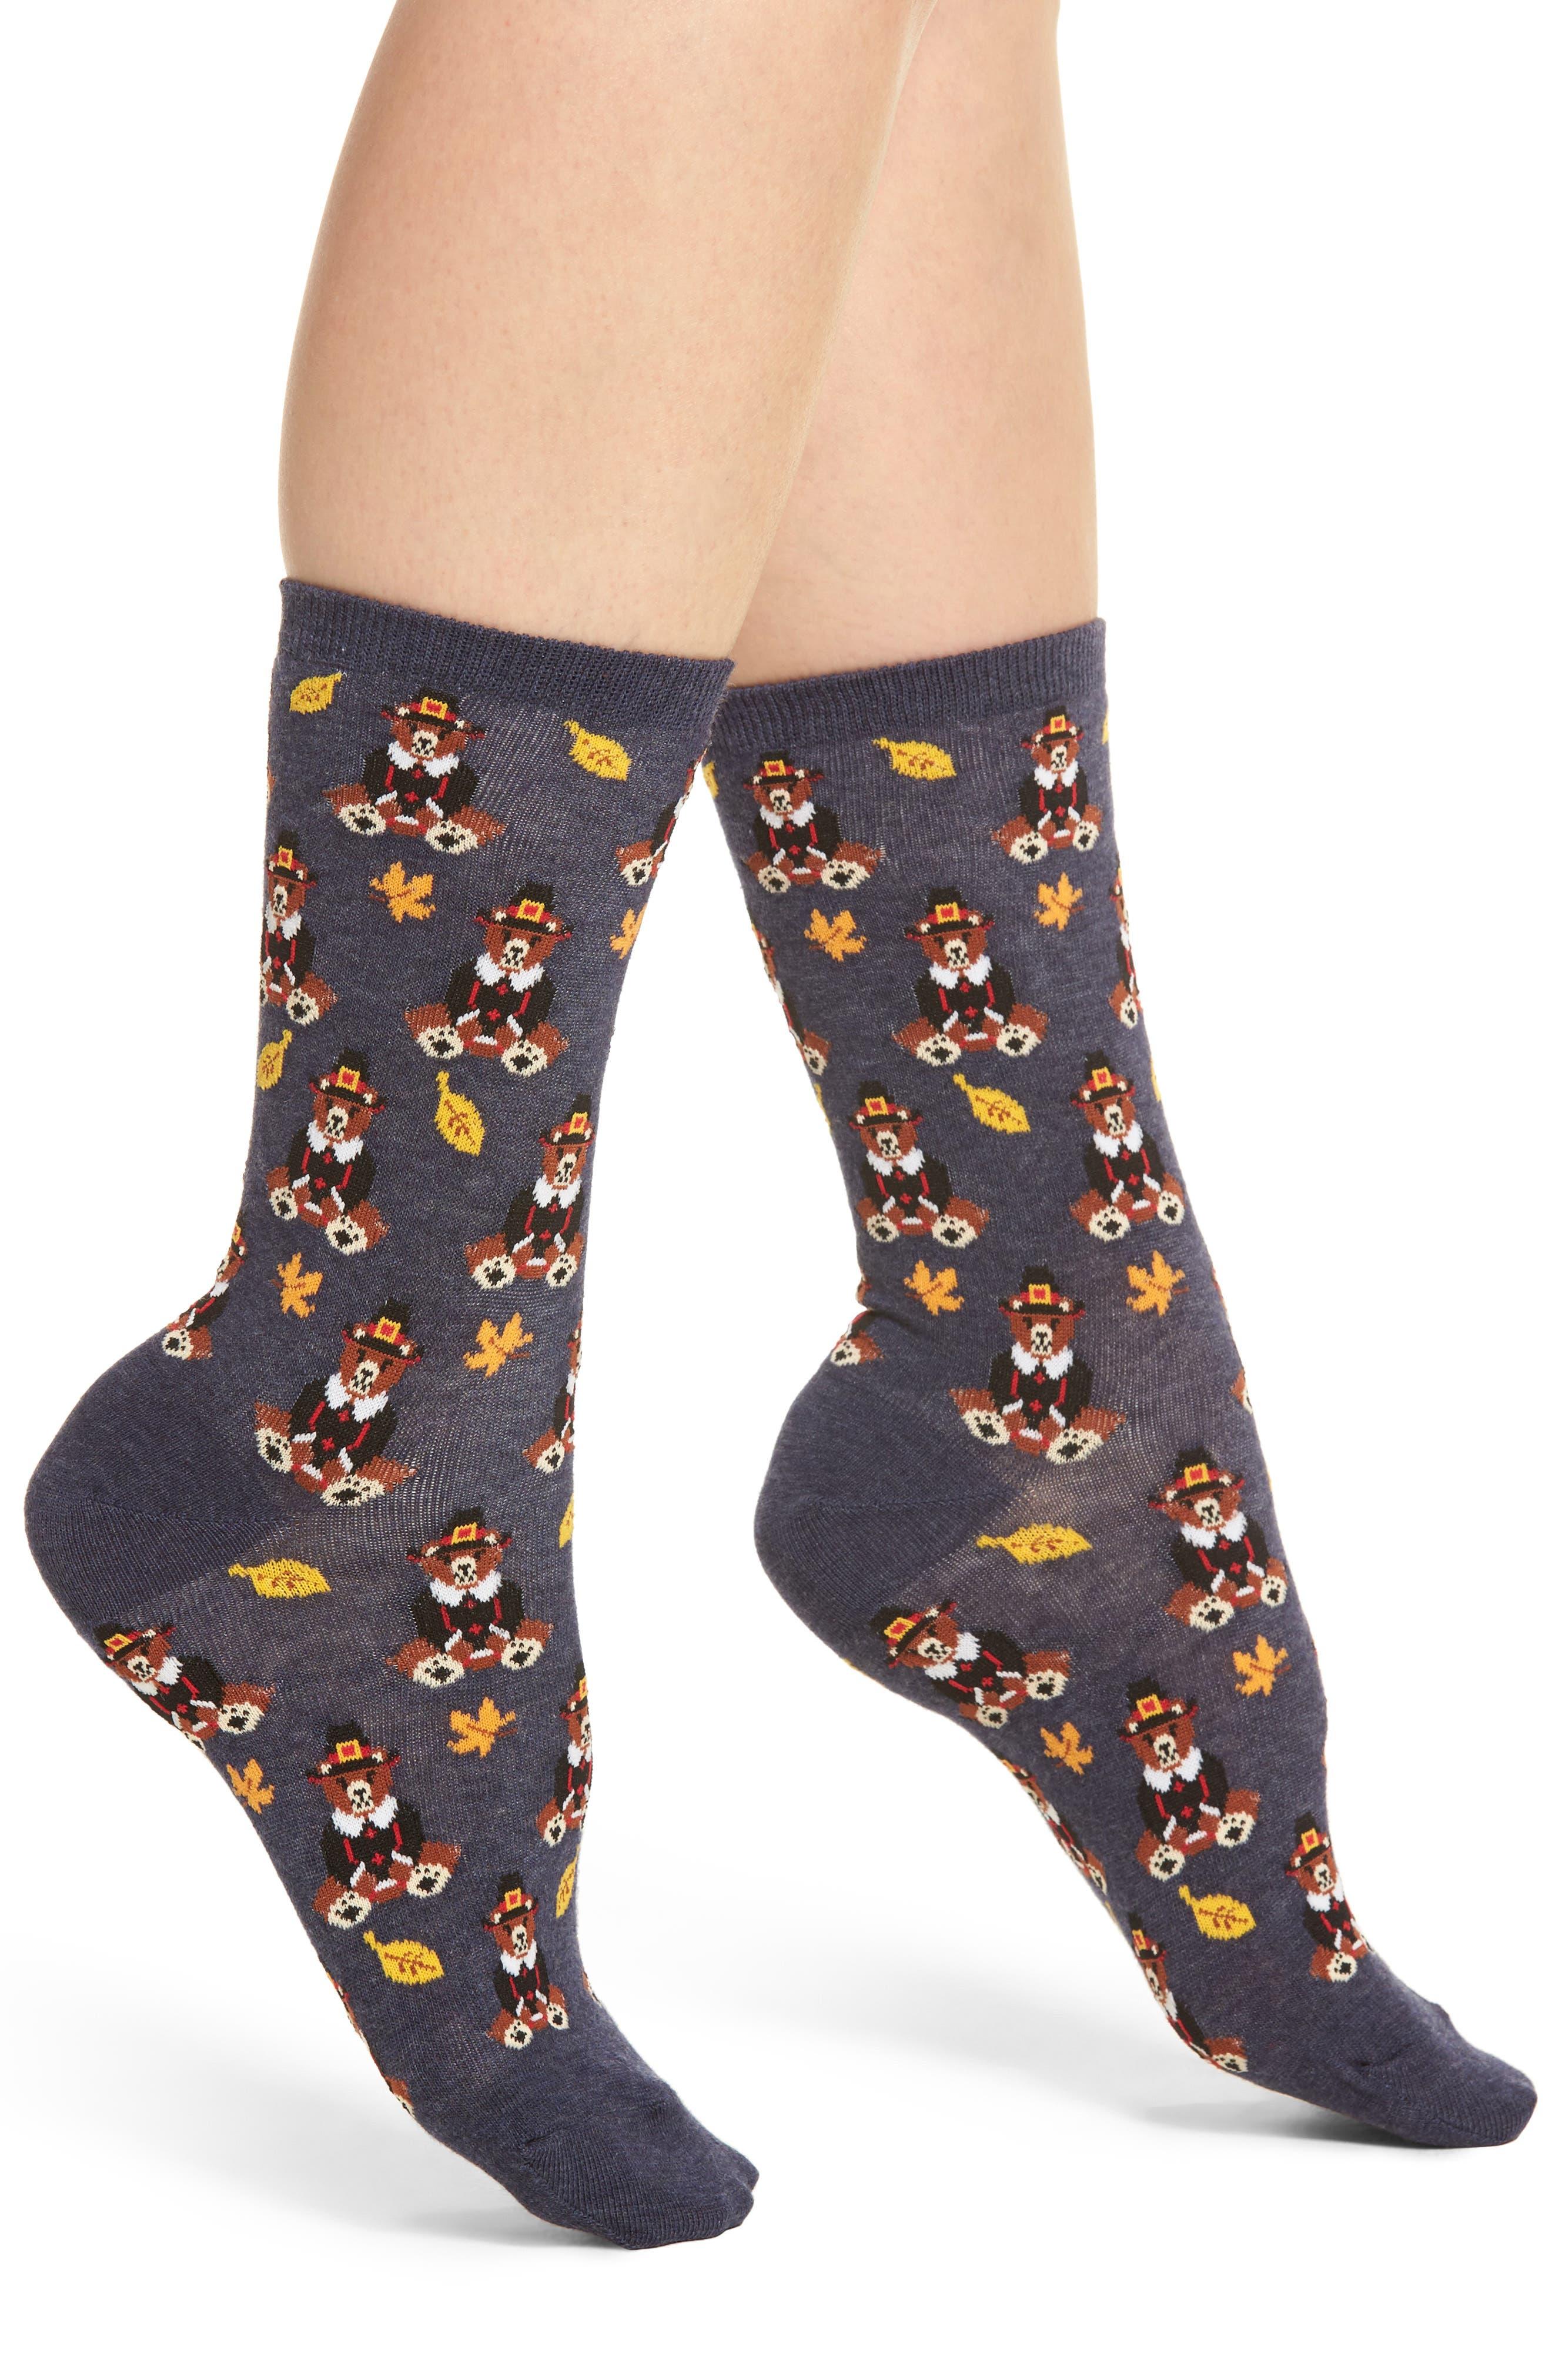 Alternate Image 1 Selected - Hot Sox Pilgrim Bears Crew Socks